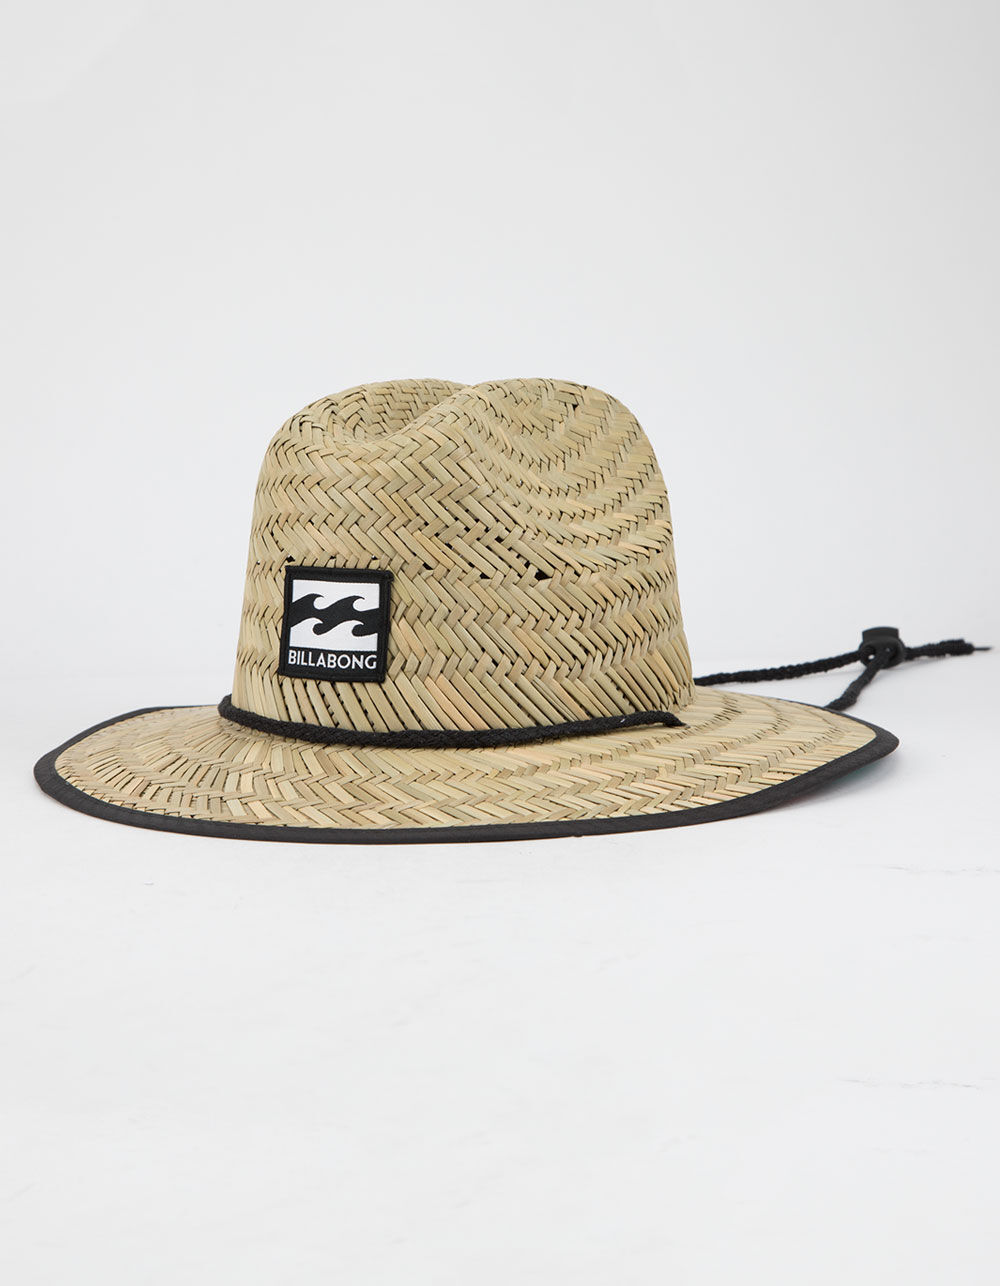 BILLABONG Tides Print Boys Lifeguard Straw Hat